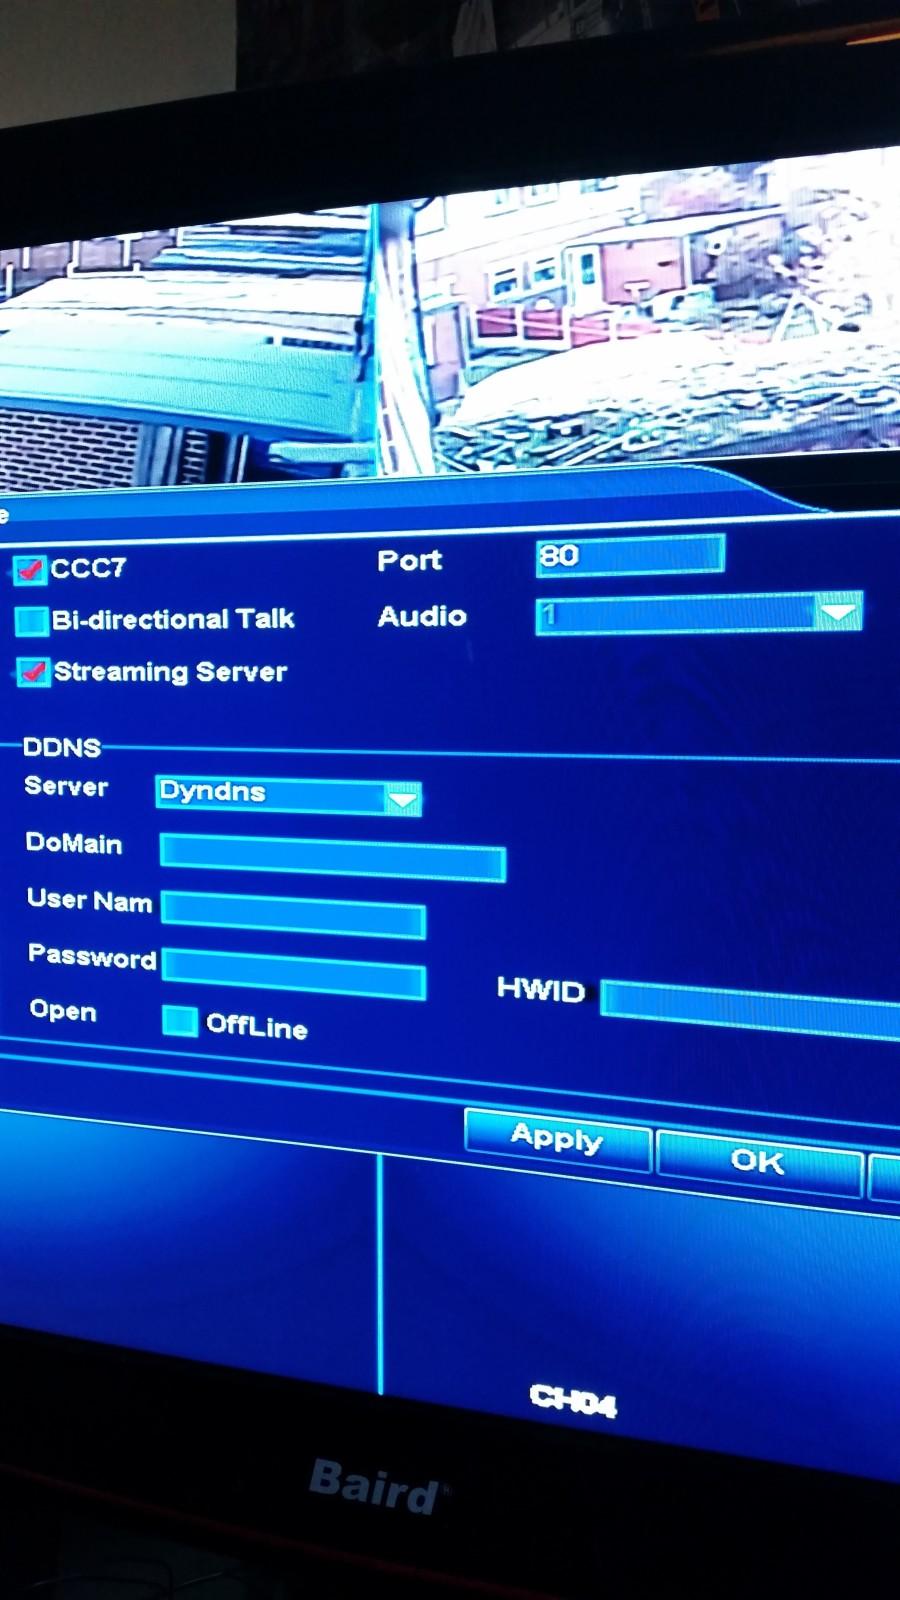 Floureon CCTV & Mobile App - without WIFI? - General Digital